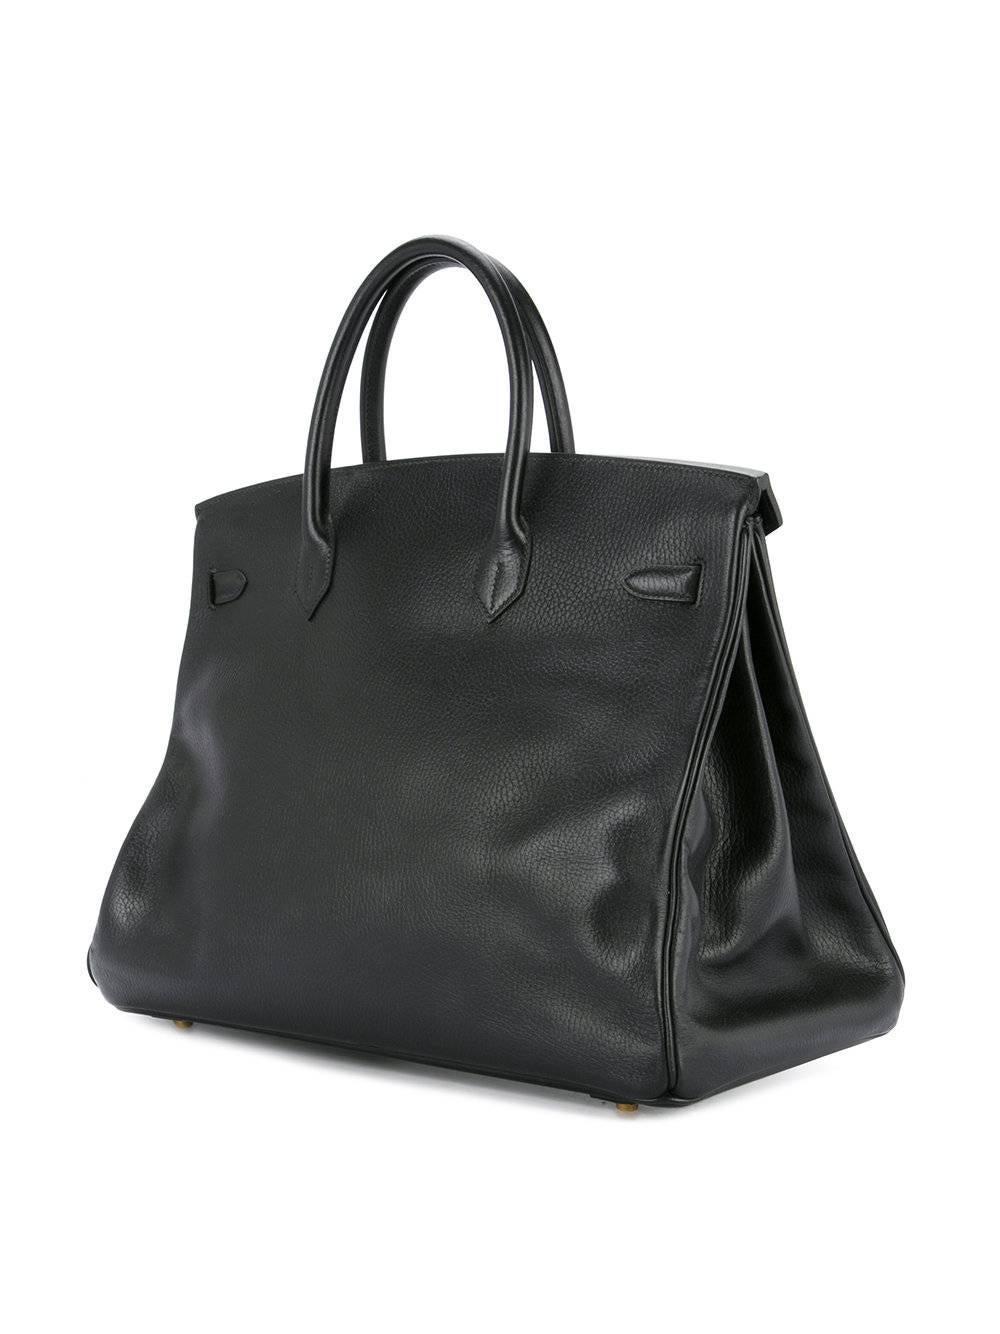 dbb29bf97282 ... ebay womens hermes birkin 35 black leather gold carryall satchel travel  travel tote bag for sale